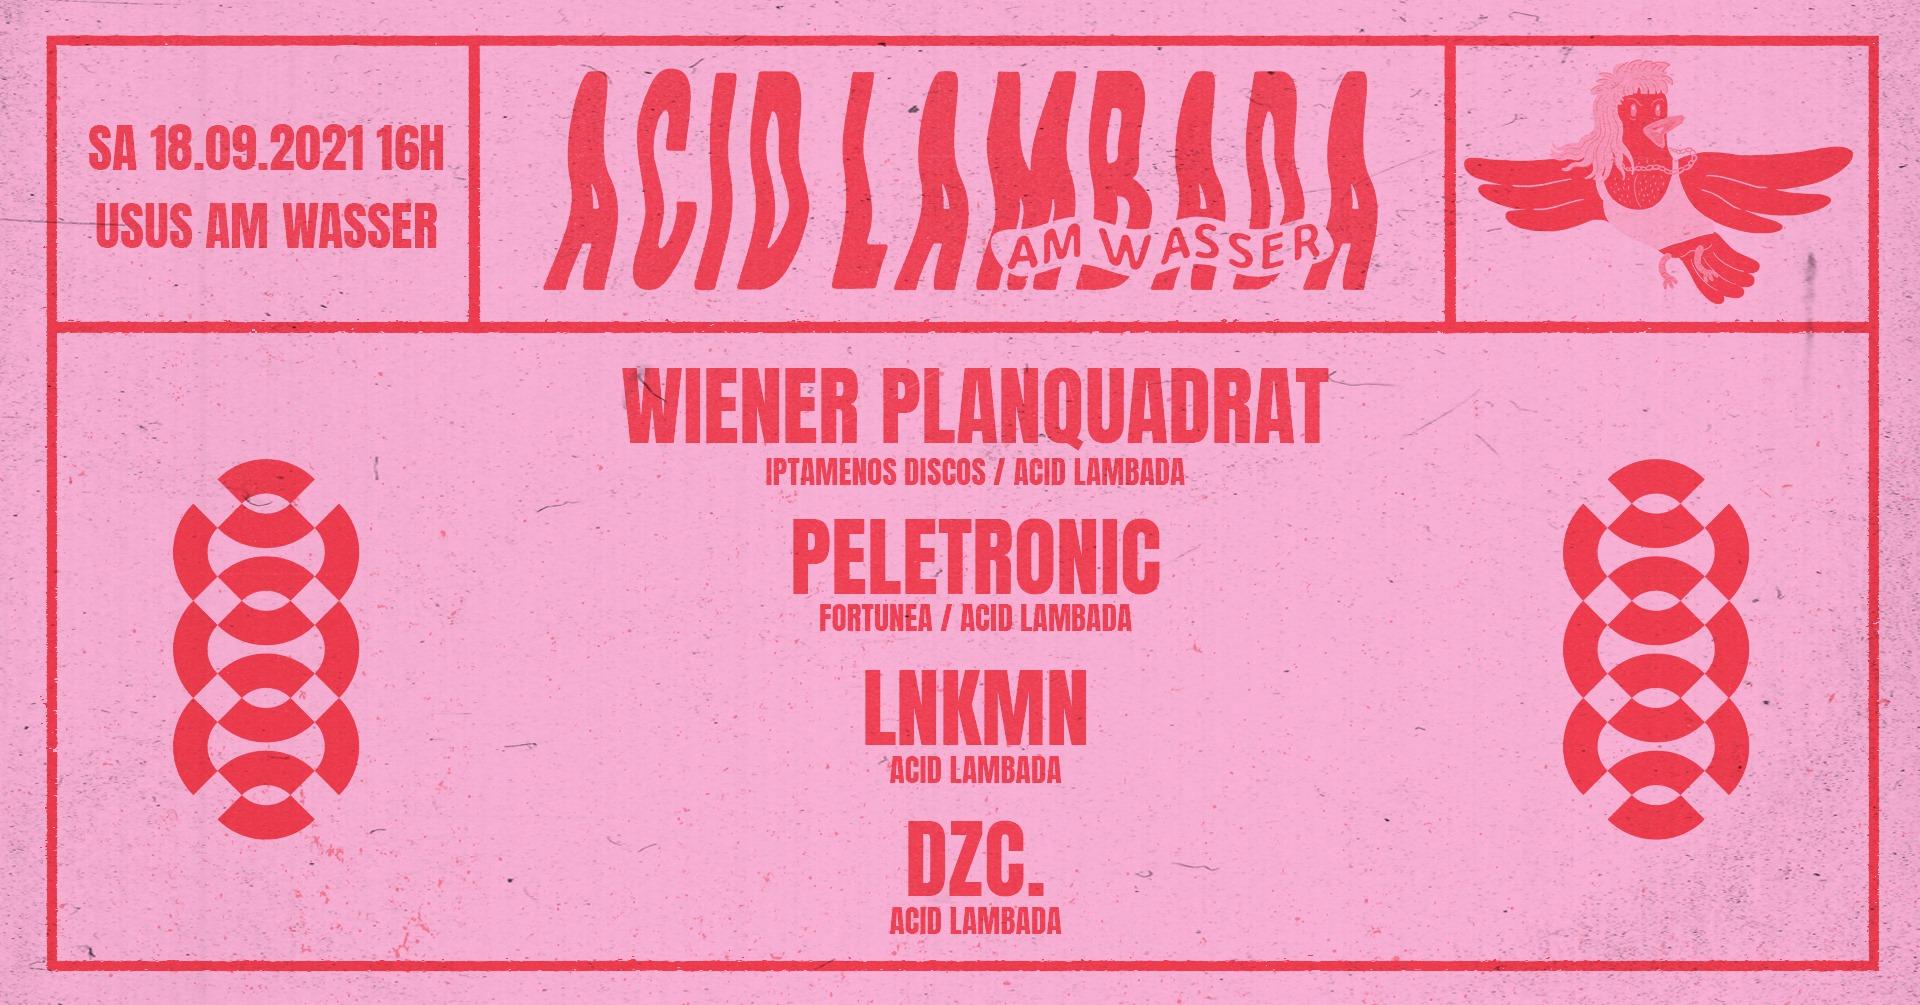 Events Wien: Acid Lambada am Wasser